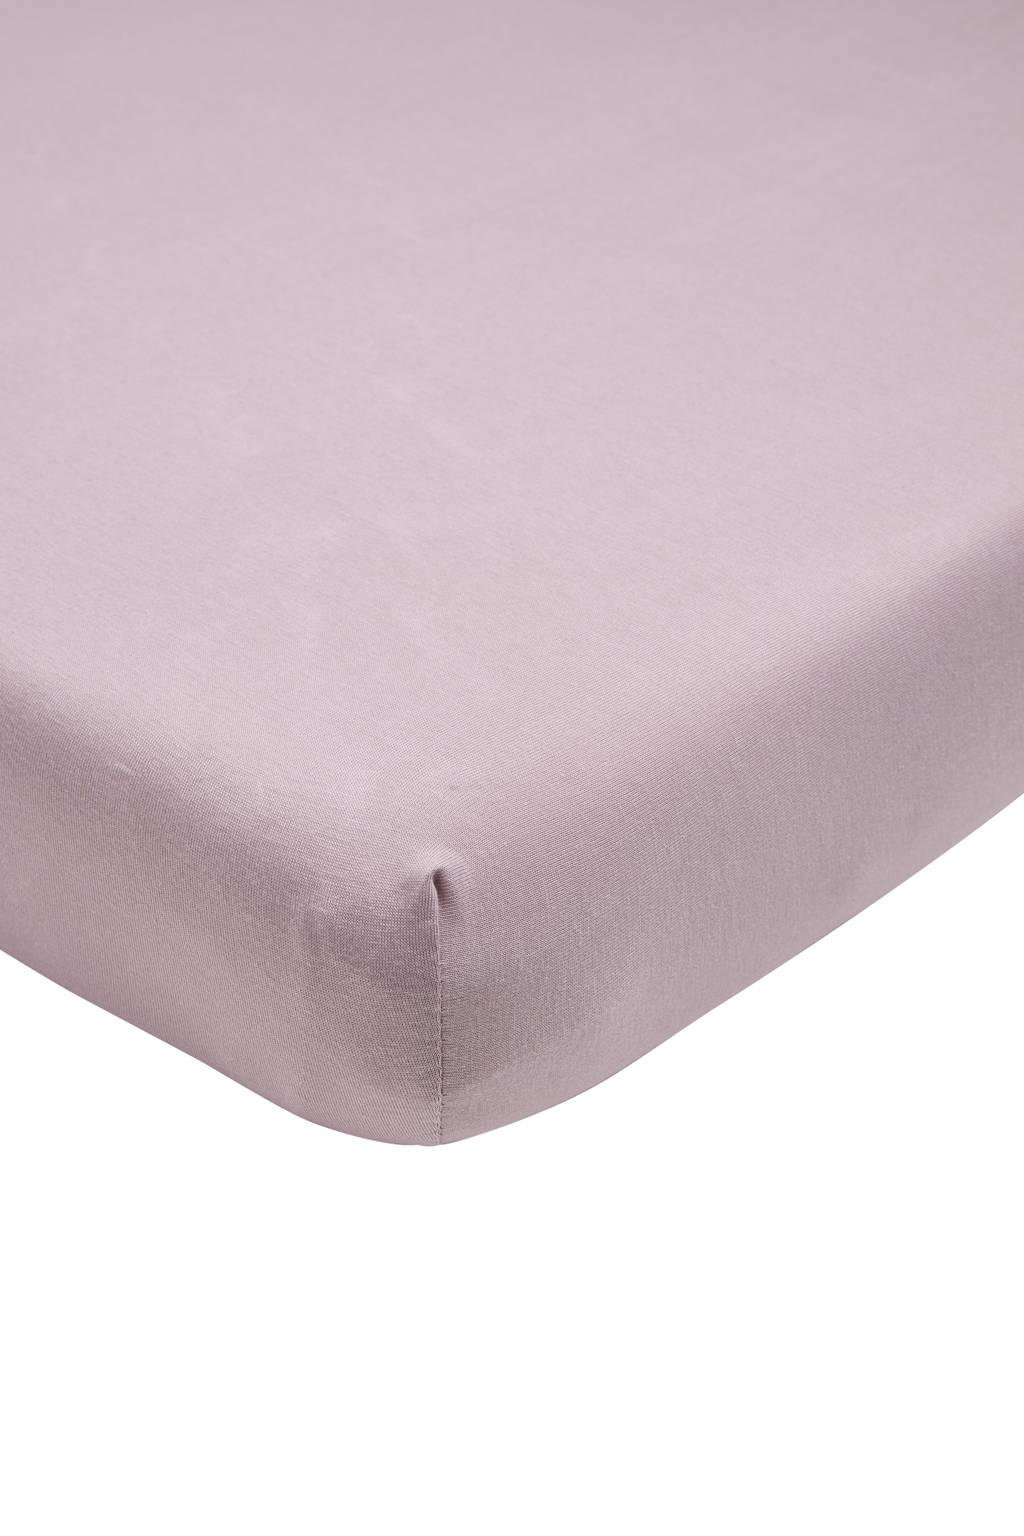 Meyco katoenen jersey hoeslaken ledikant 60x120 lilac Lila